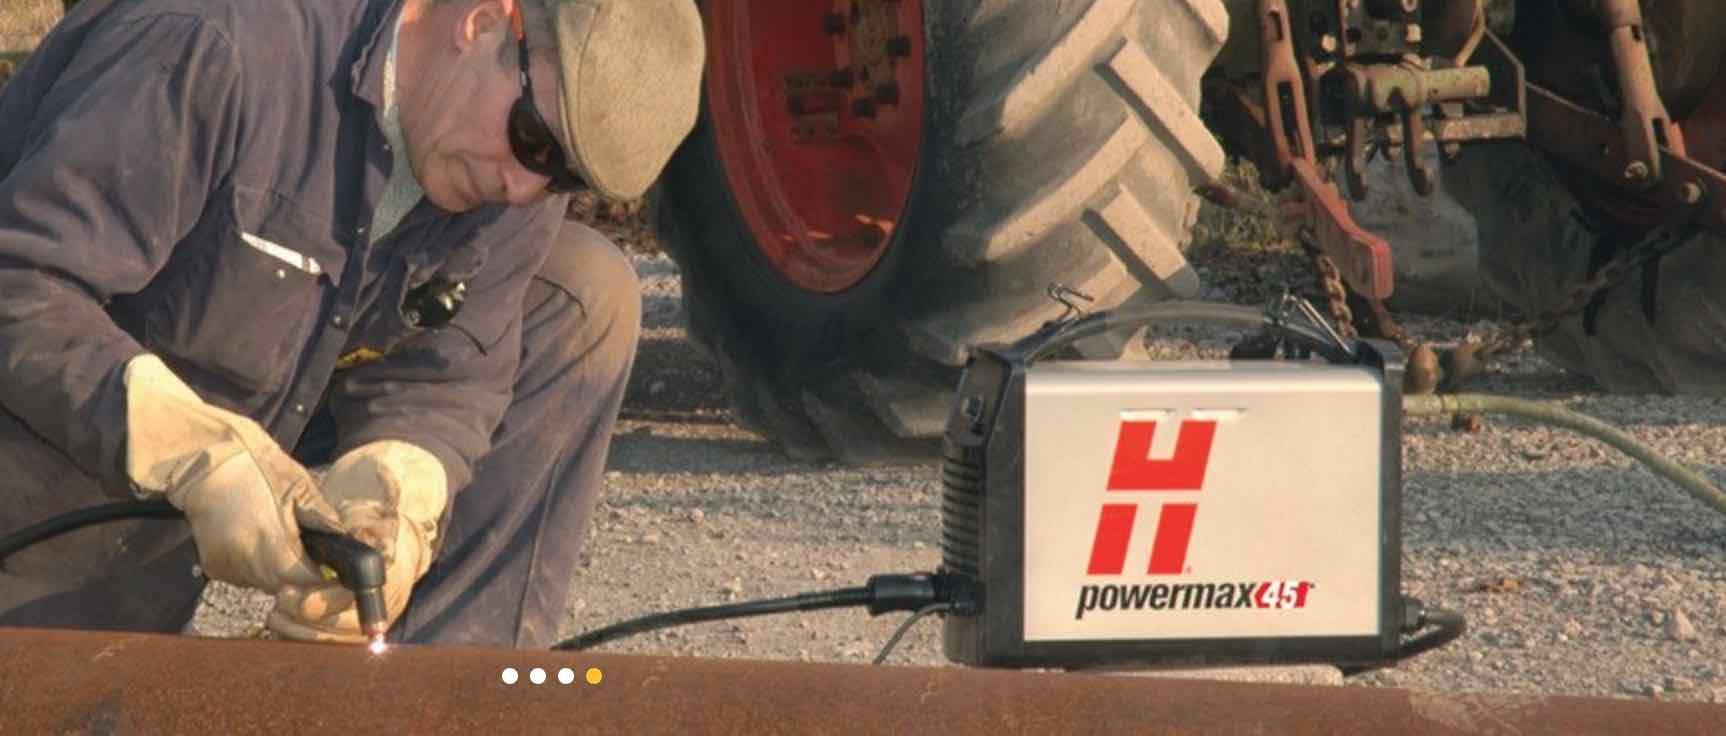 hypertherm-powermax-45-air-plasma-cutting-machine-2.jpg